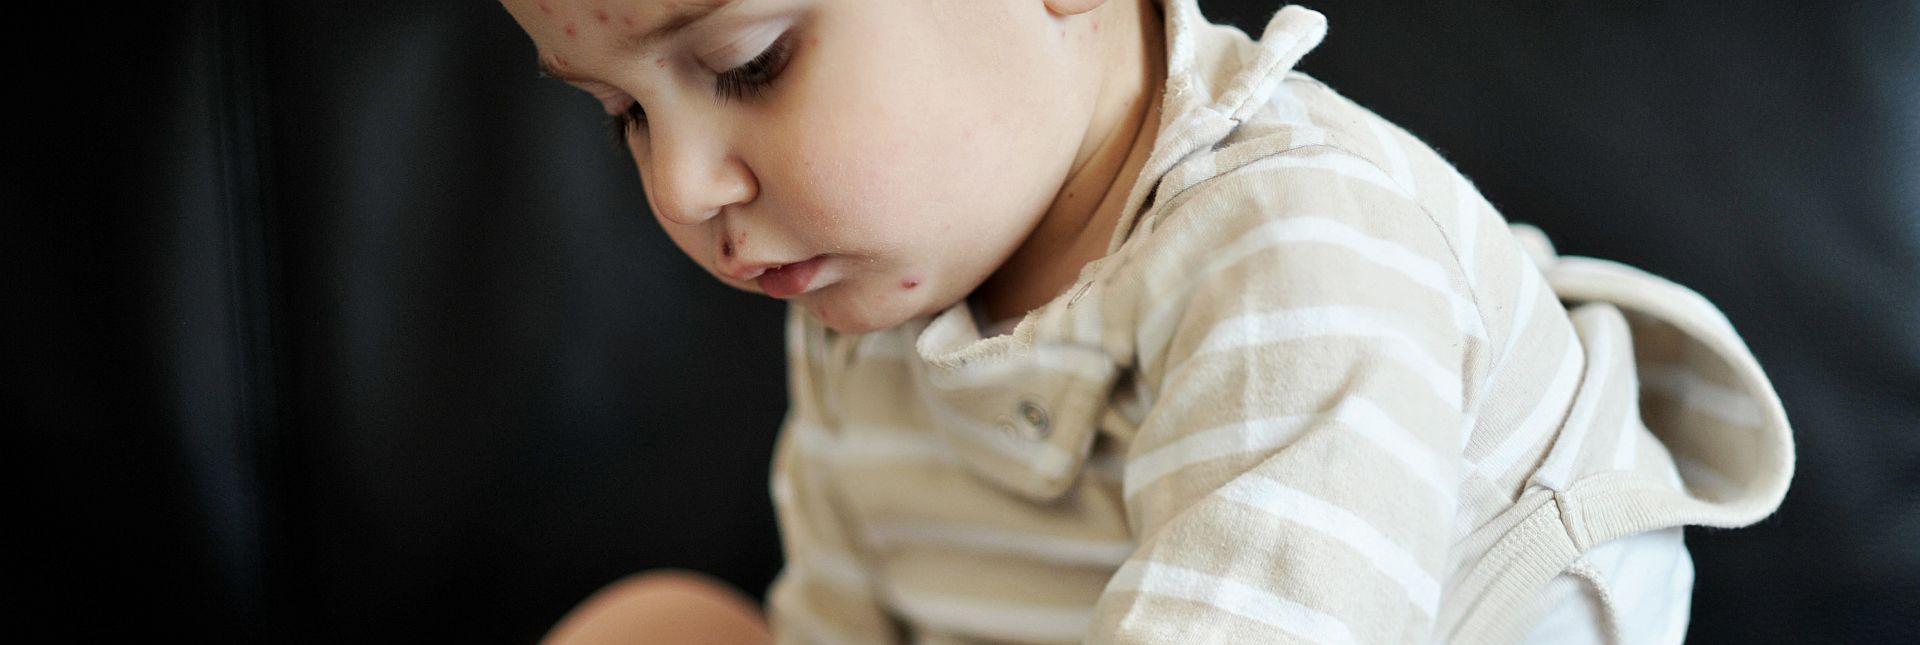 Neurodermitis bei Baby